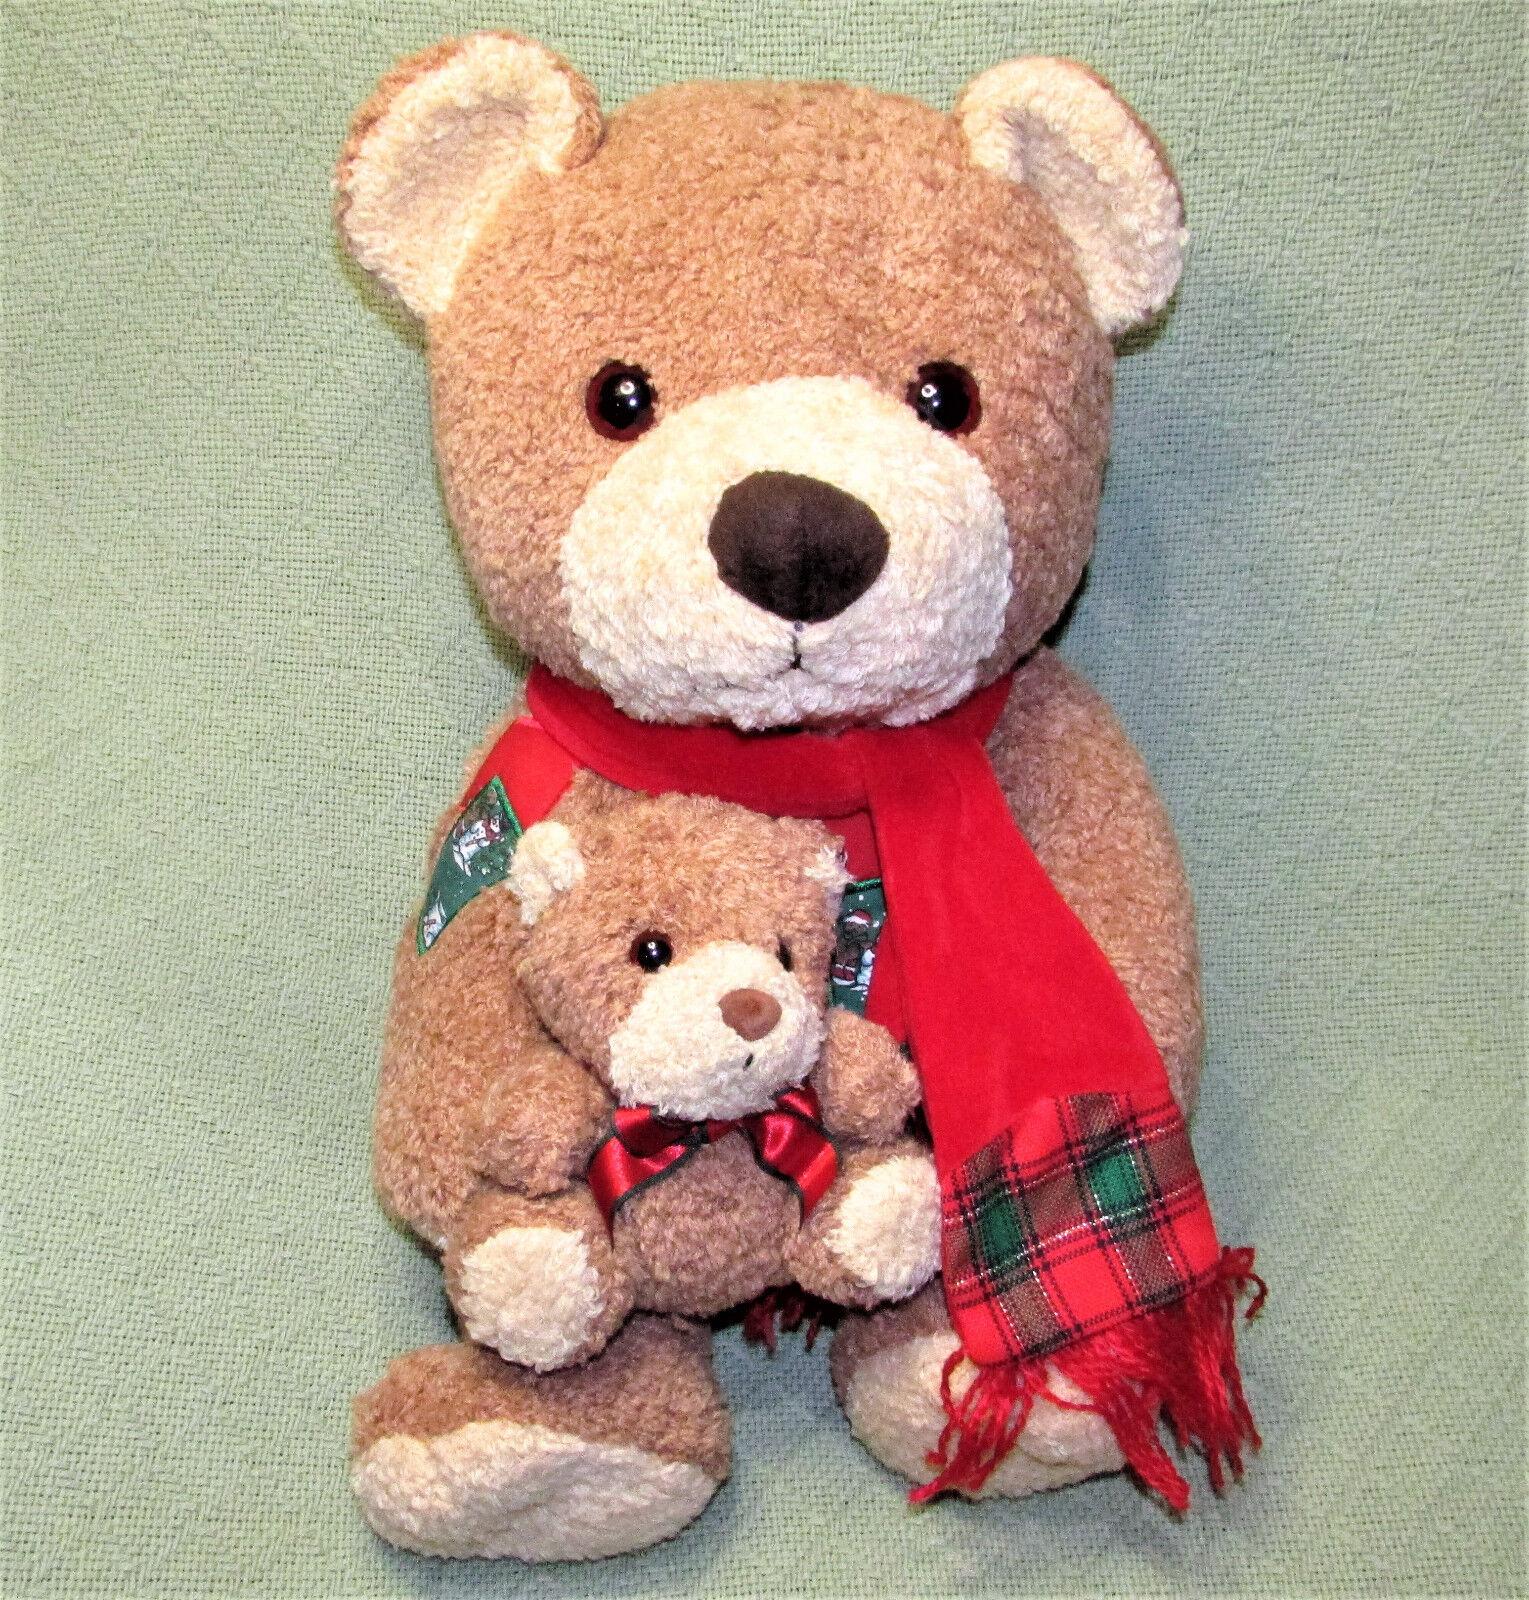 16  1999 Kids Preferred TEDDY BEAR + BABY CUB Patch RED SCARF Vintage Plush Toy